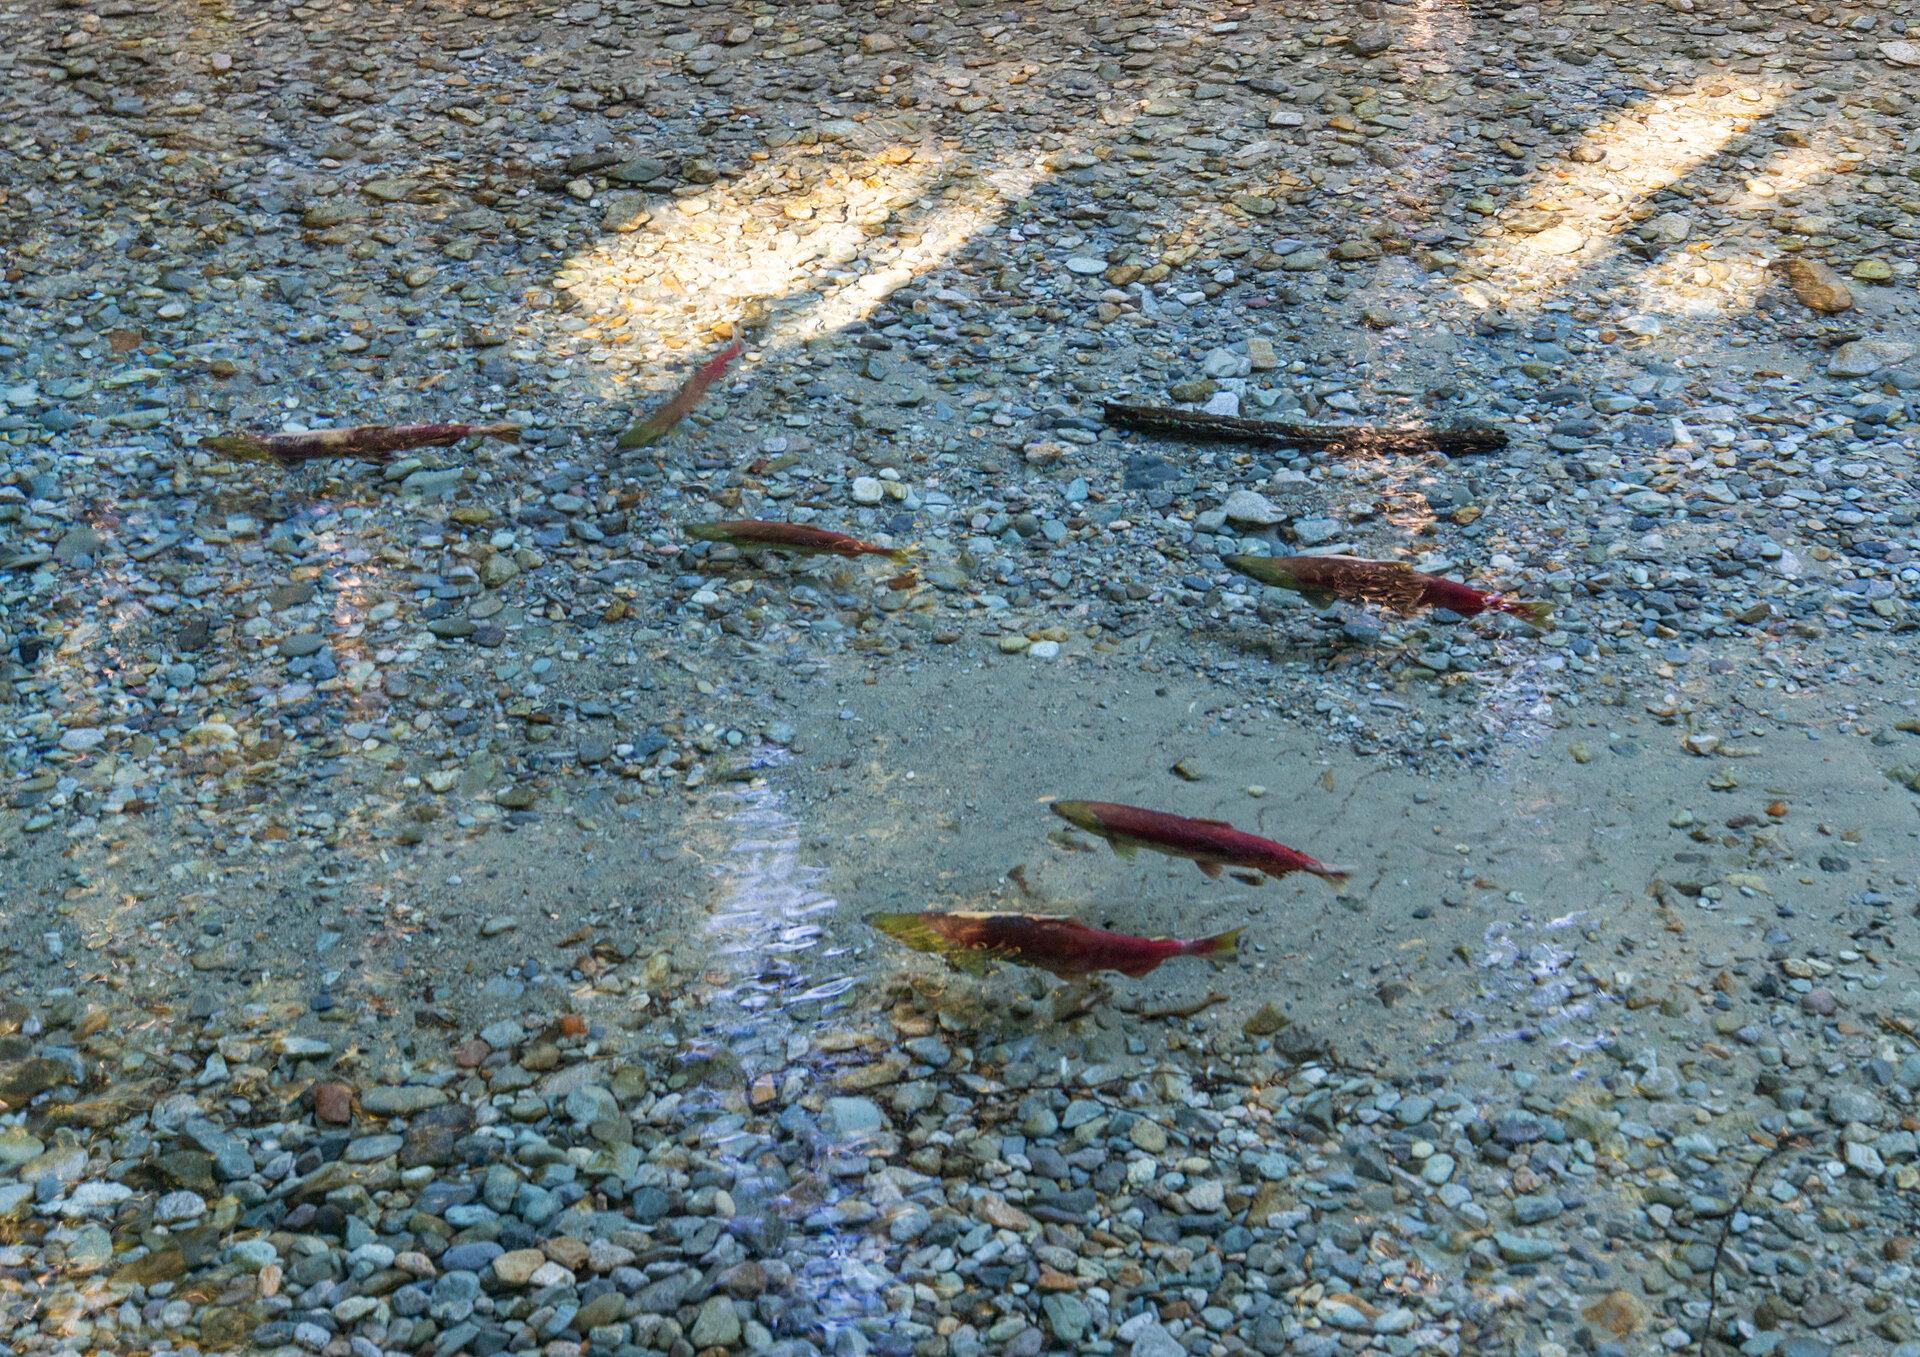 Wild salmon in the Chilliwack River